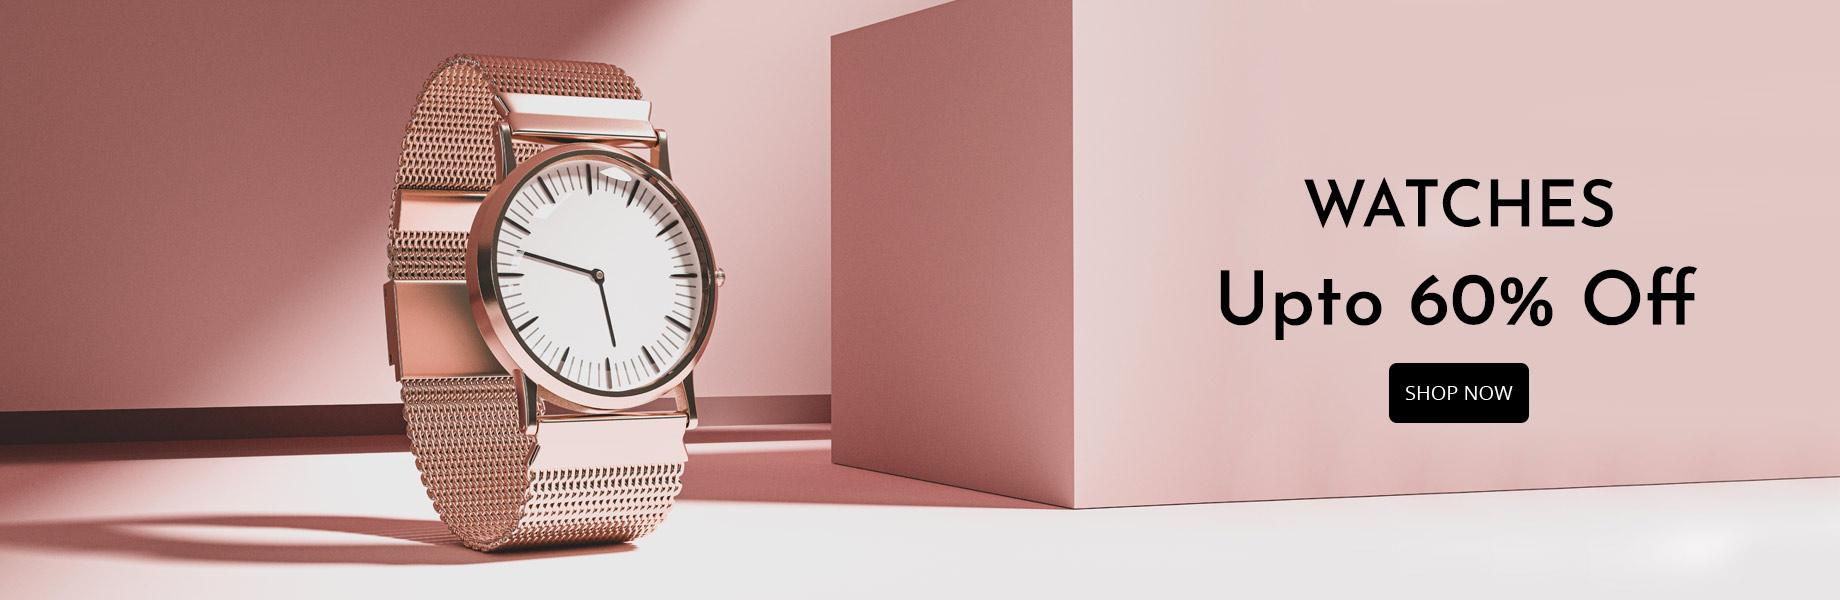 Womens-Page-Western-Wear-Static-Watches-Web.jpg